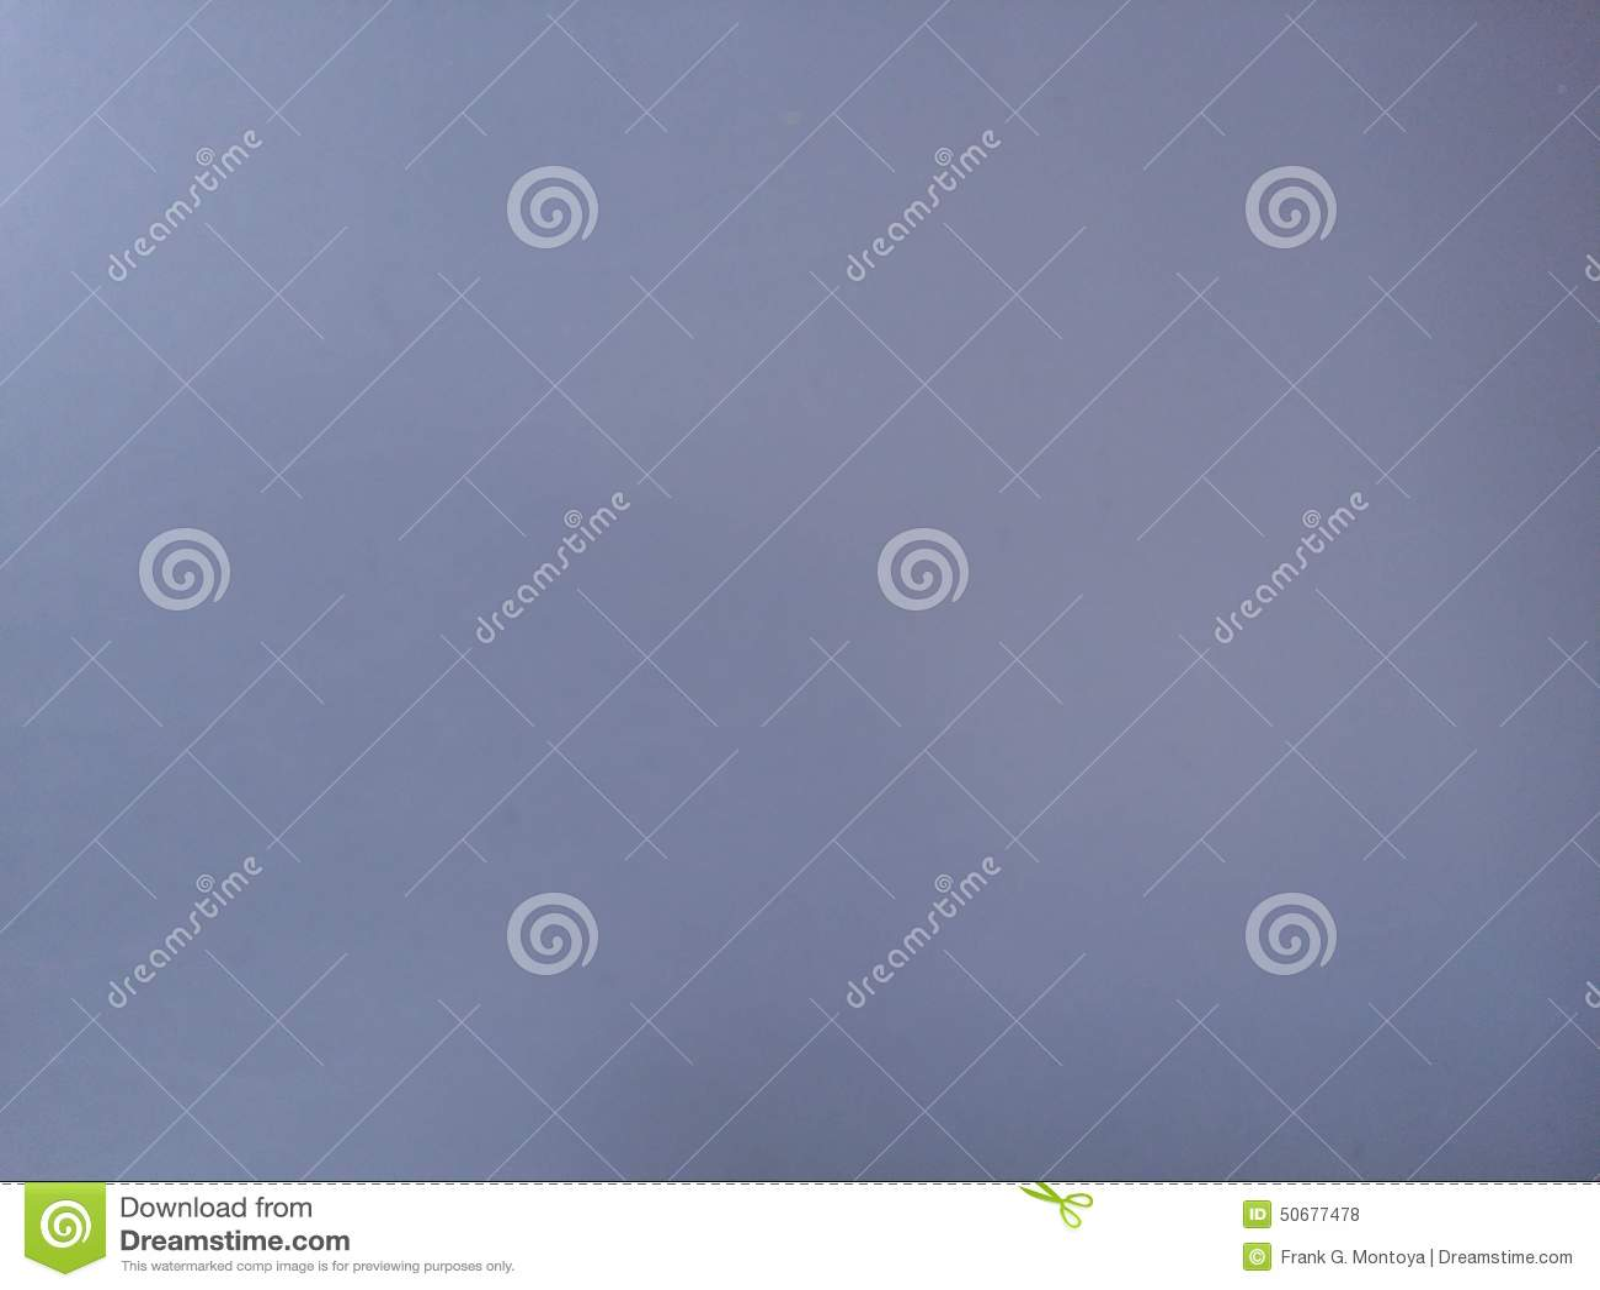 Download 灰色蓝色背景 库存照片. 图片 包括有 靠山, 平稳, 蓝色, 不完美, 背包, 灰色, 上色 - 50677478